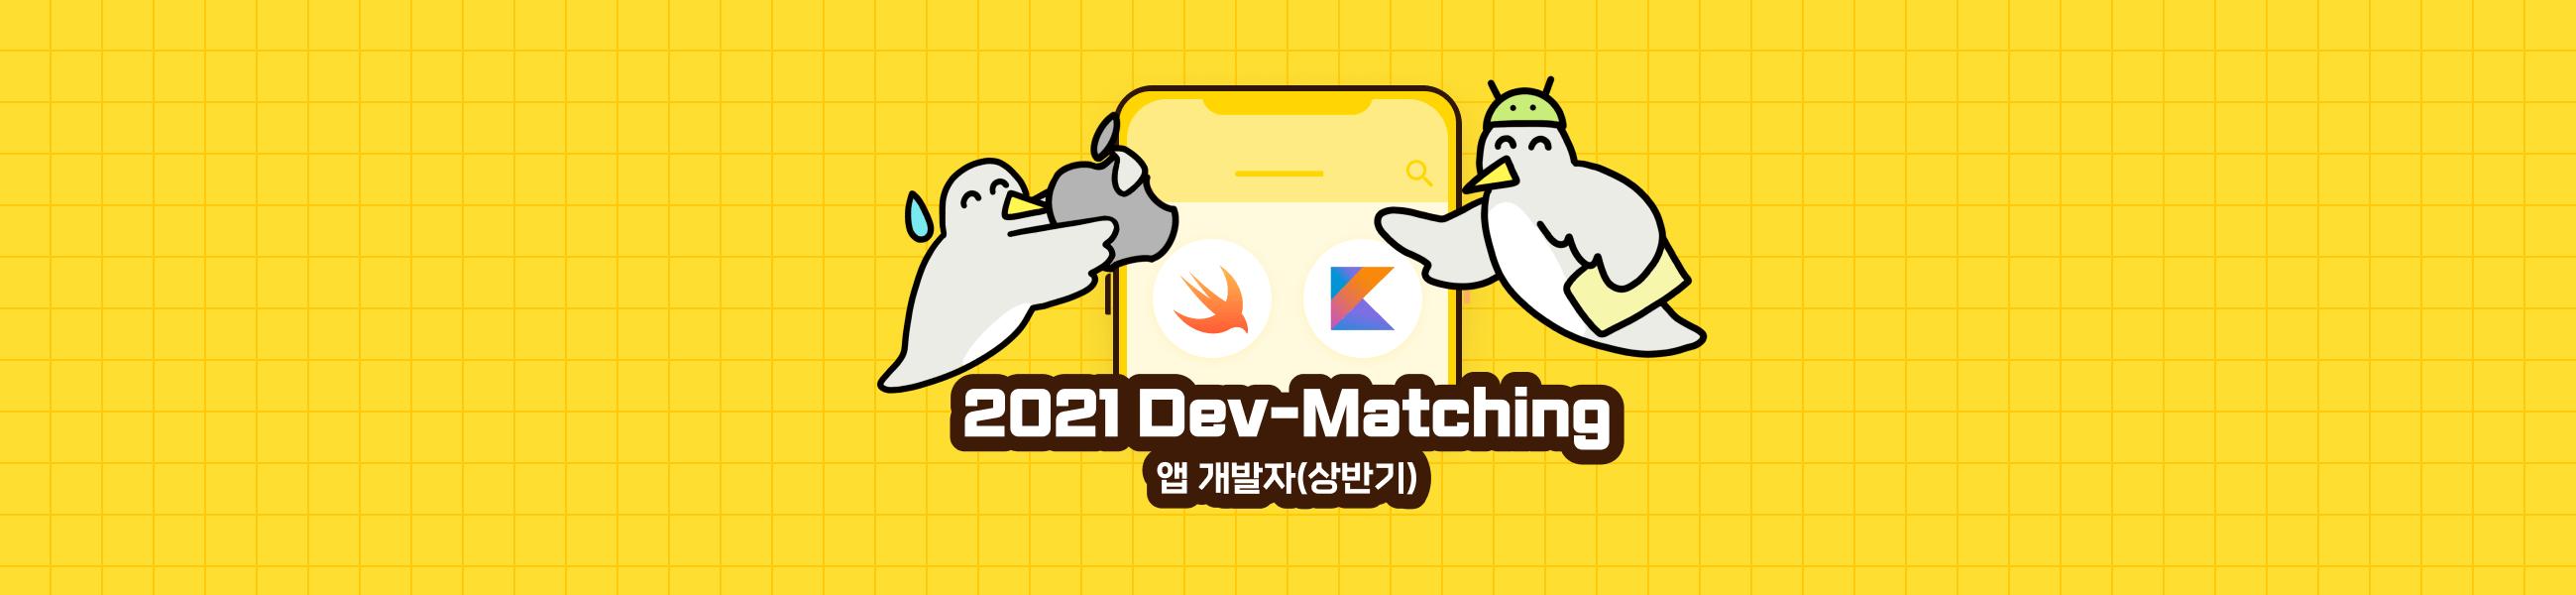 2021 Dev-Matching: 앱 개발자(상반기)의 이미지